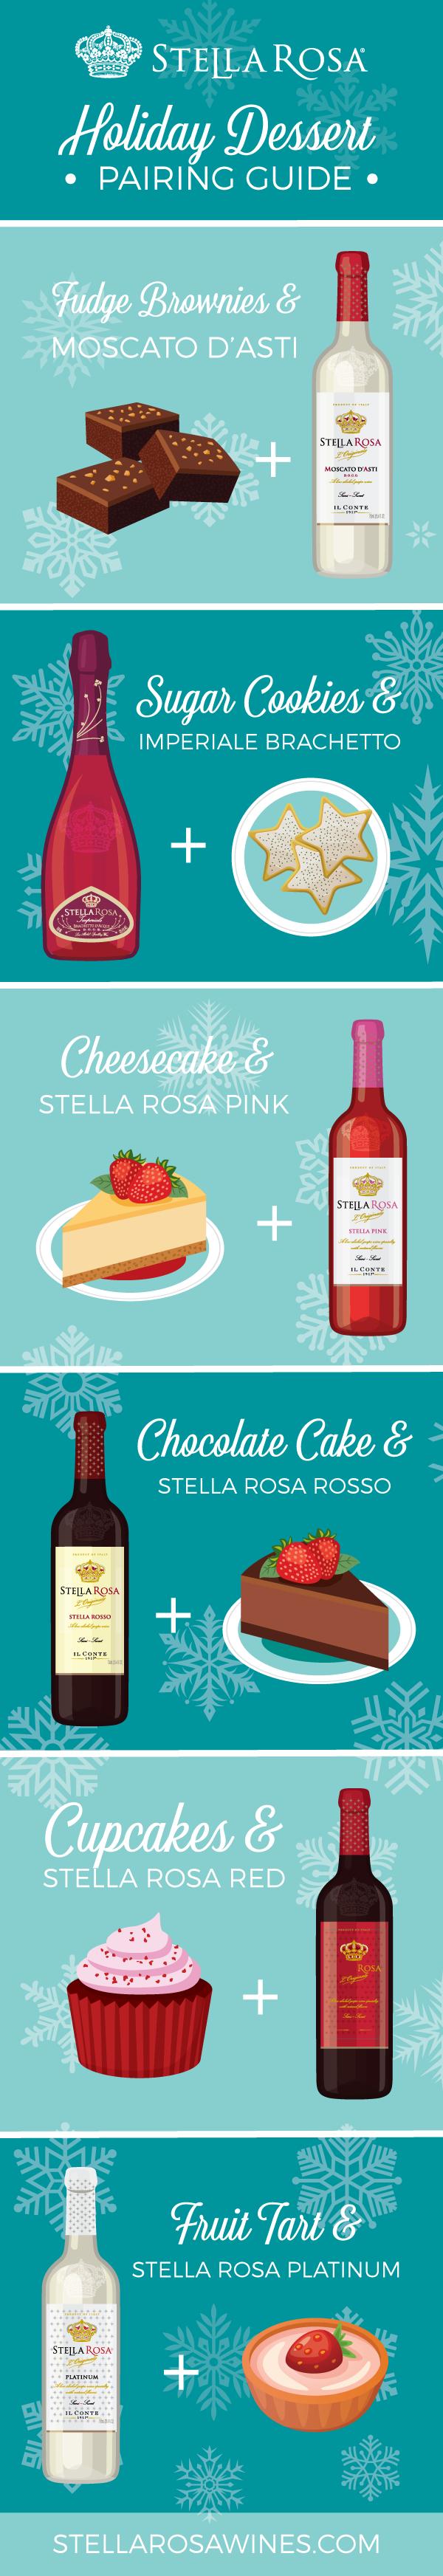 SR_Dessert_Pairing_Guide_Nov.png